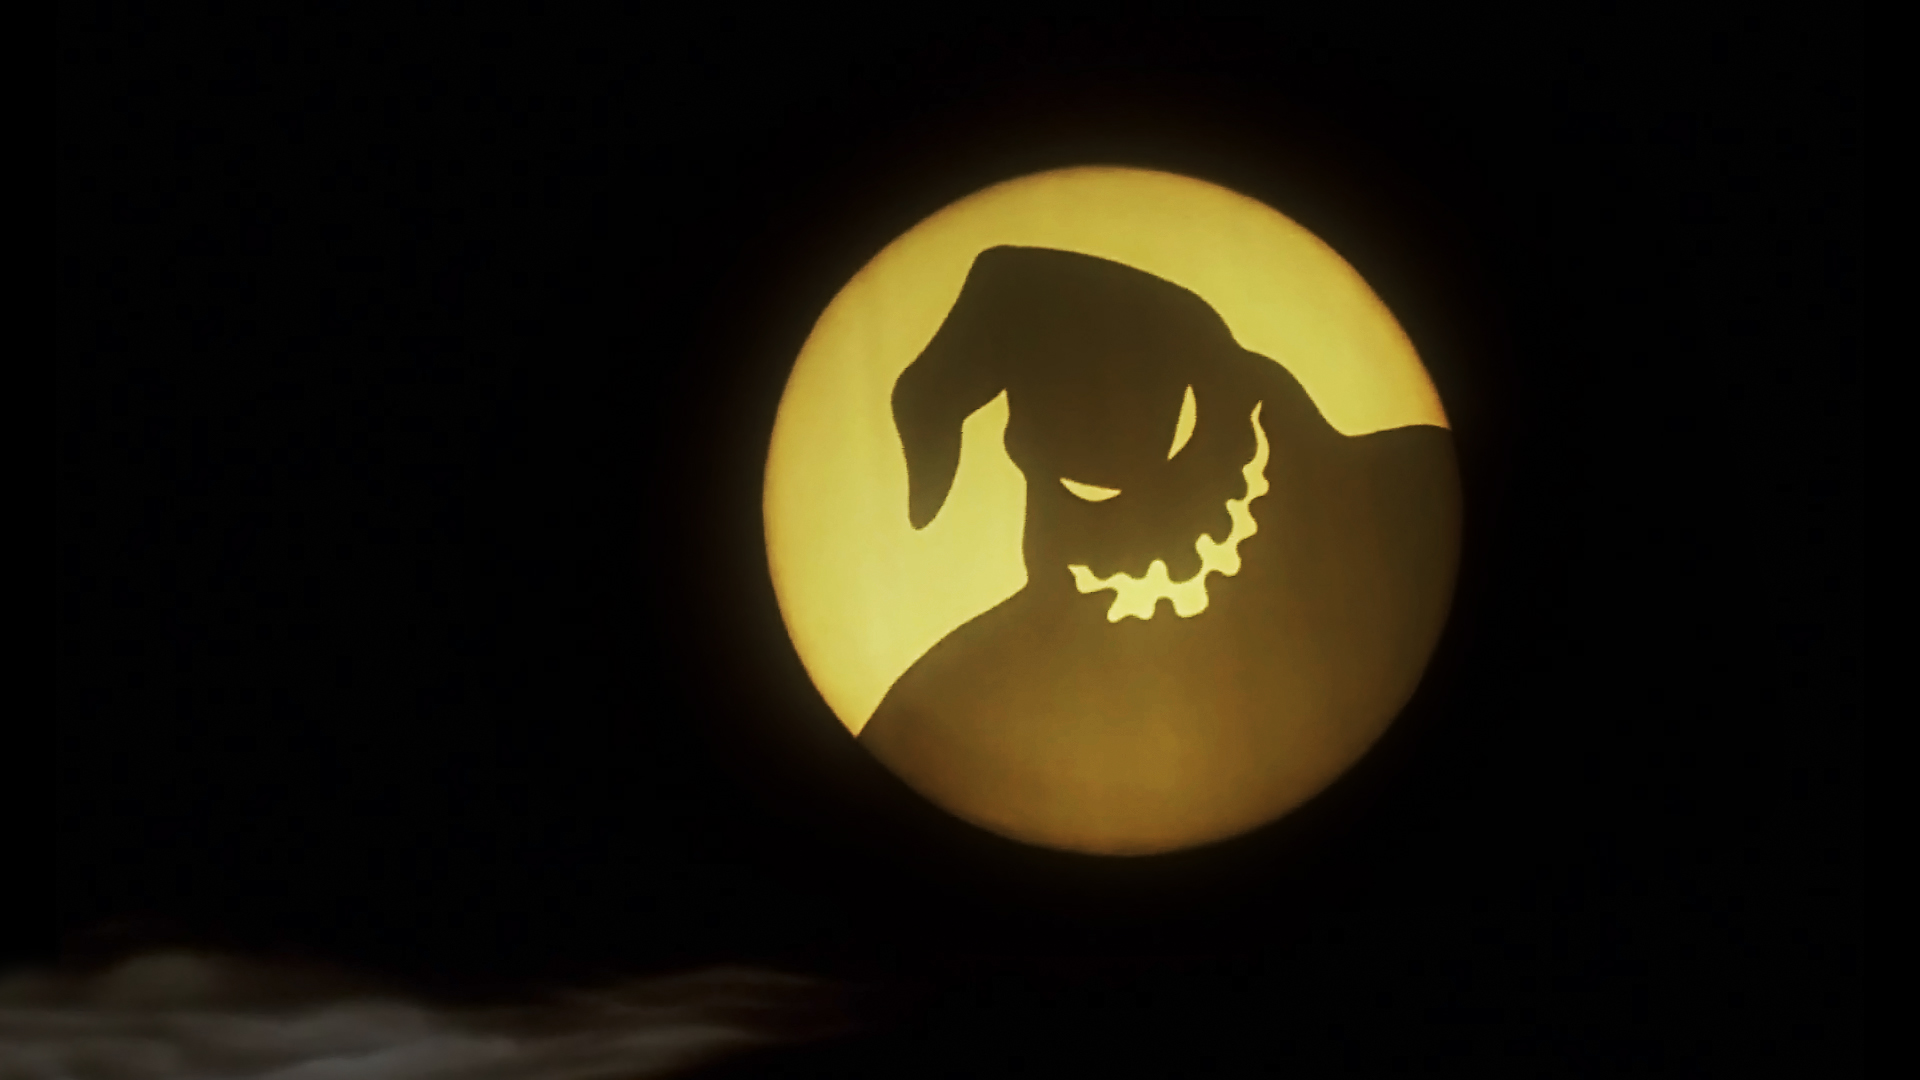 Fantasmas en halloween - 1920x1080